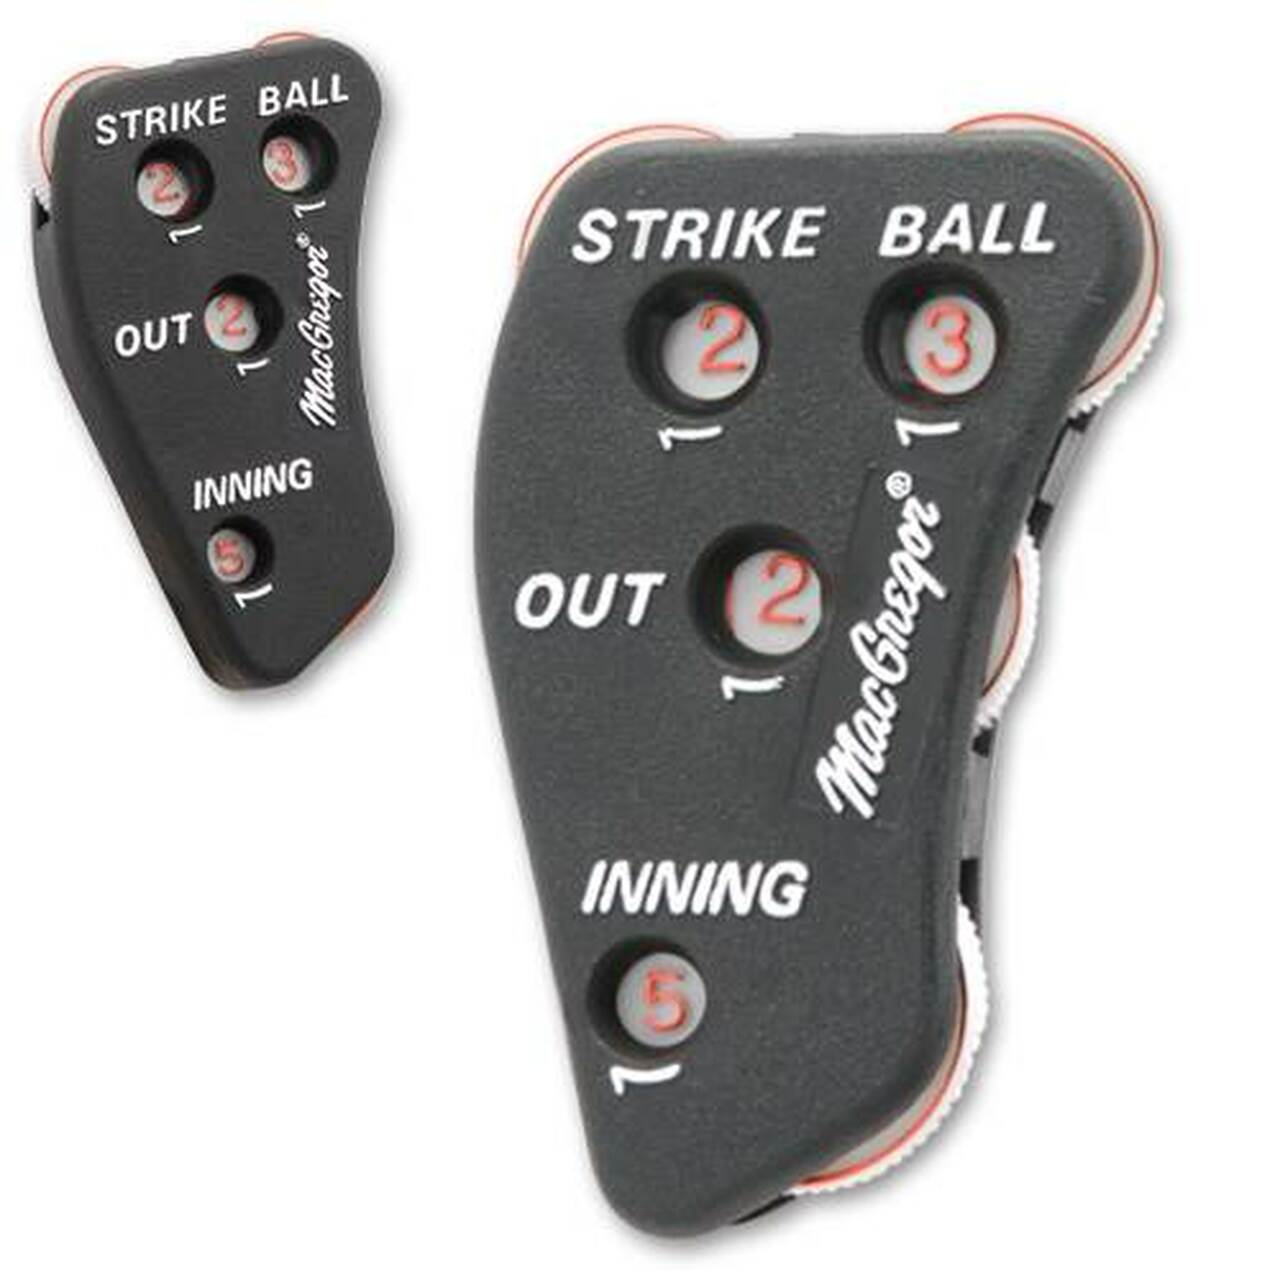 MacGregor Baseball 4-Way Umpire's Indicator